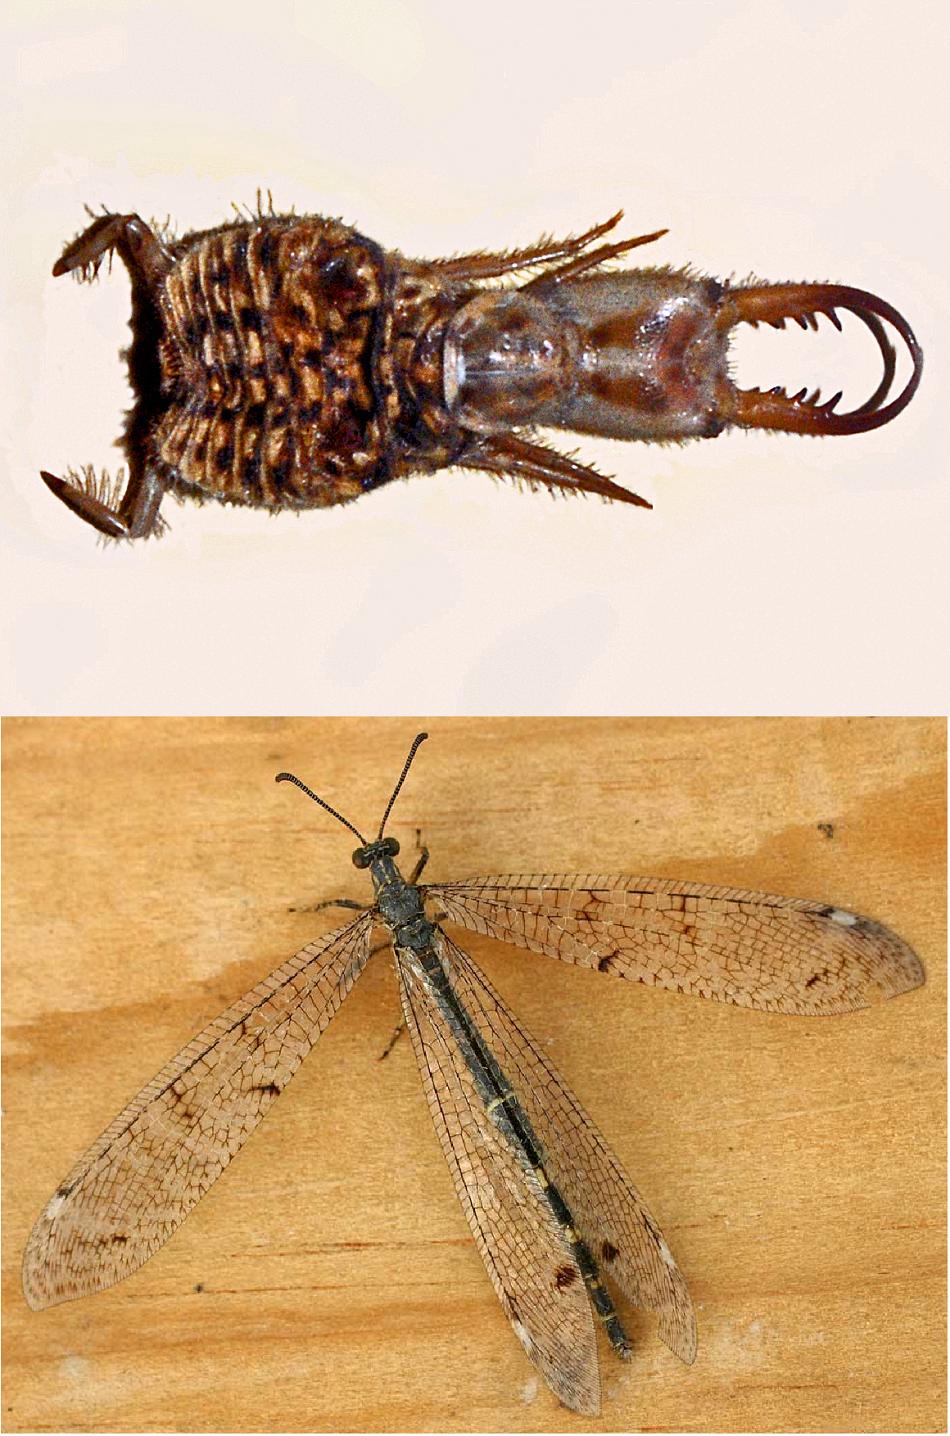 Nahoře dravá larva mravkolva ostruhatého (Distoleon tetragrammicus), foto Hectonichus, CC BY-SA 3.0, https://creativecommons.org/licenses/by-sa/3.0, dole dospělý jedinec téhož druhu, foto  Entomart.